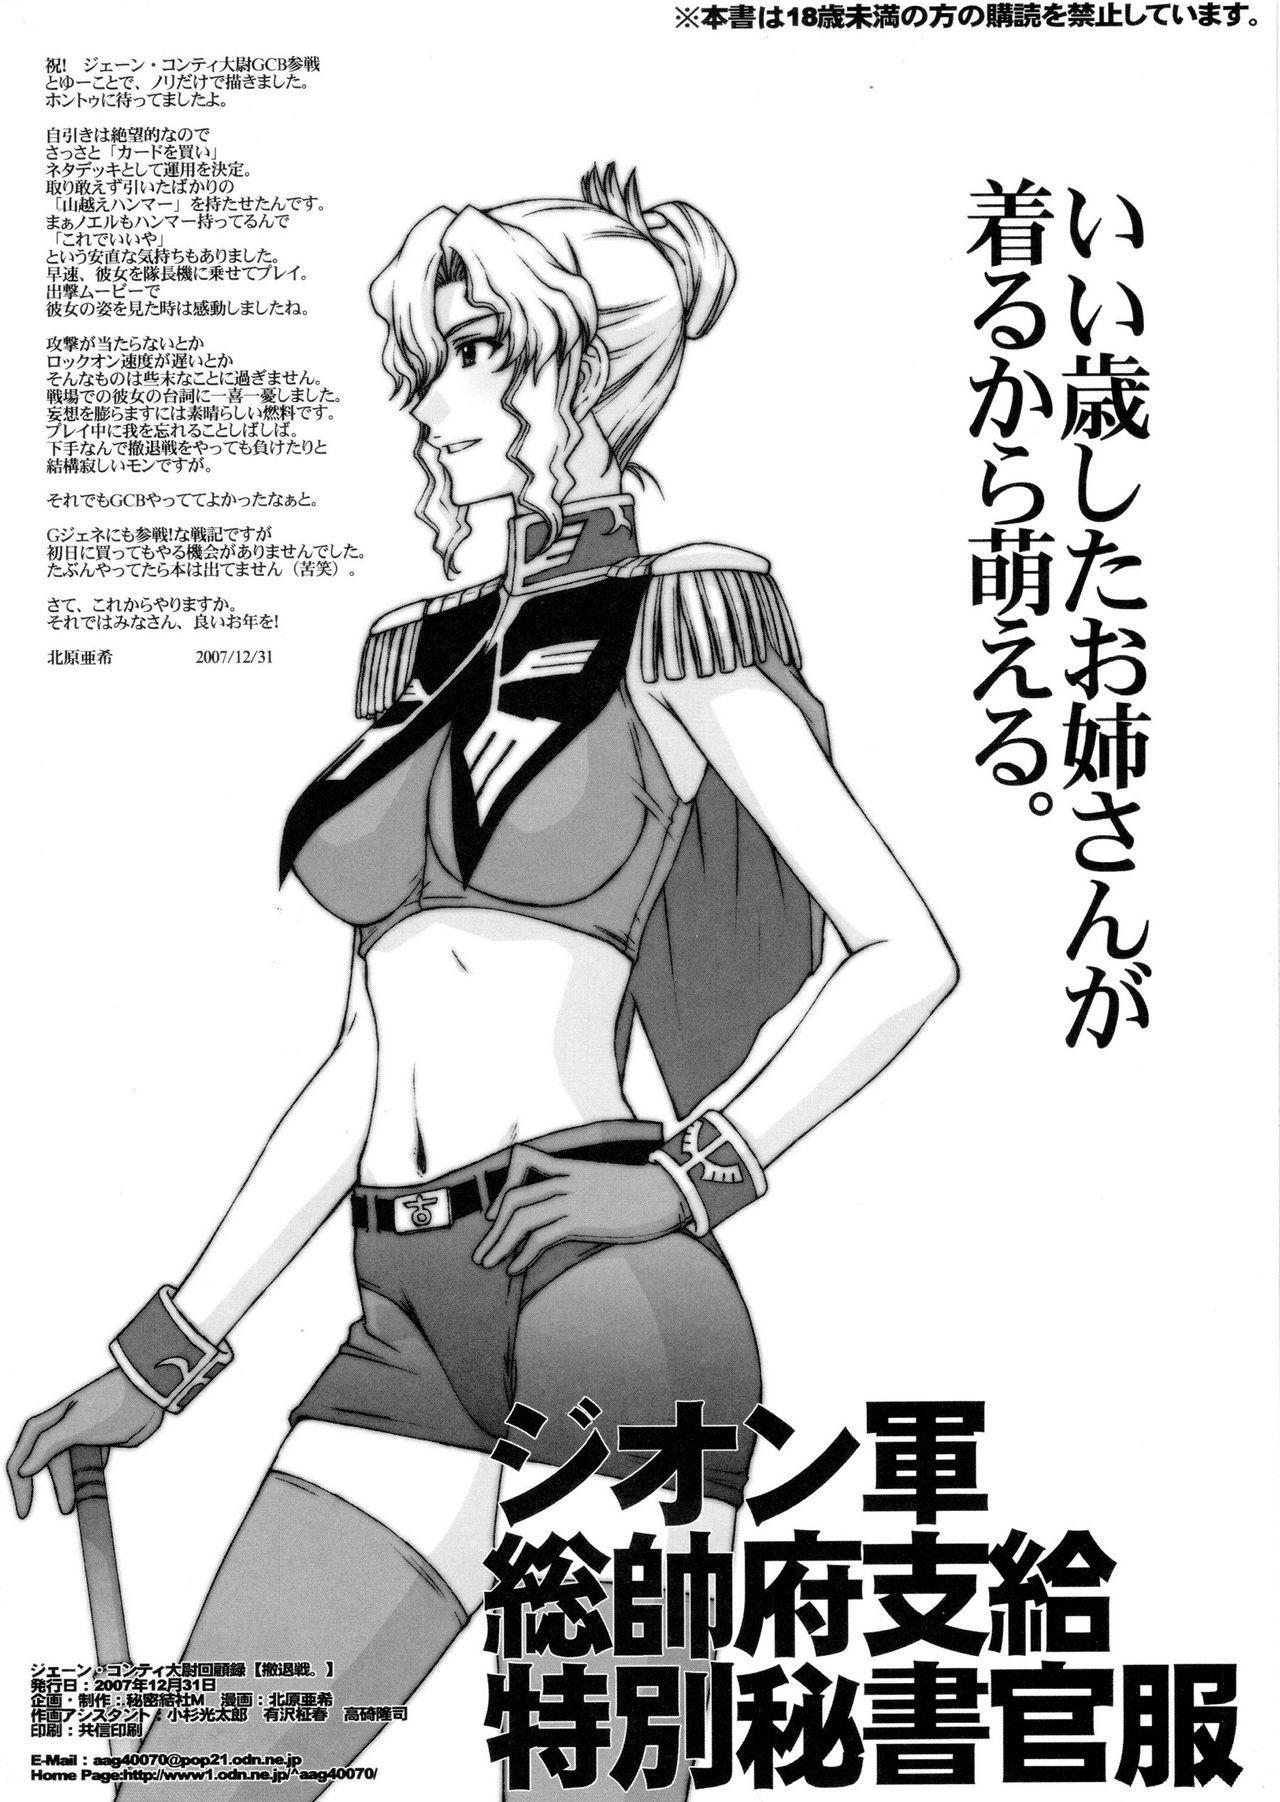 Jane Conty Taii Kaikoroku Tettaisen. | Captain Jane Conti's Guerrilla Warfare 7